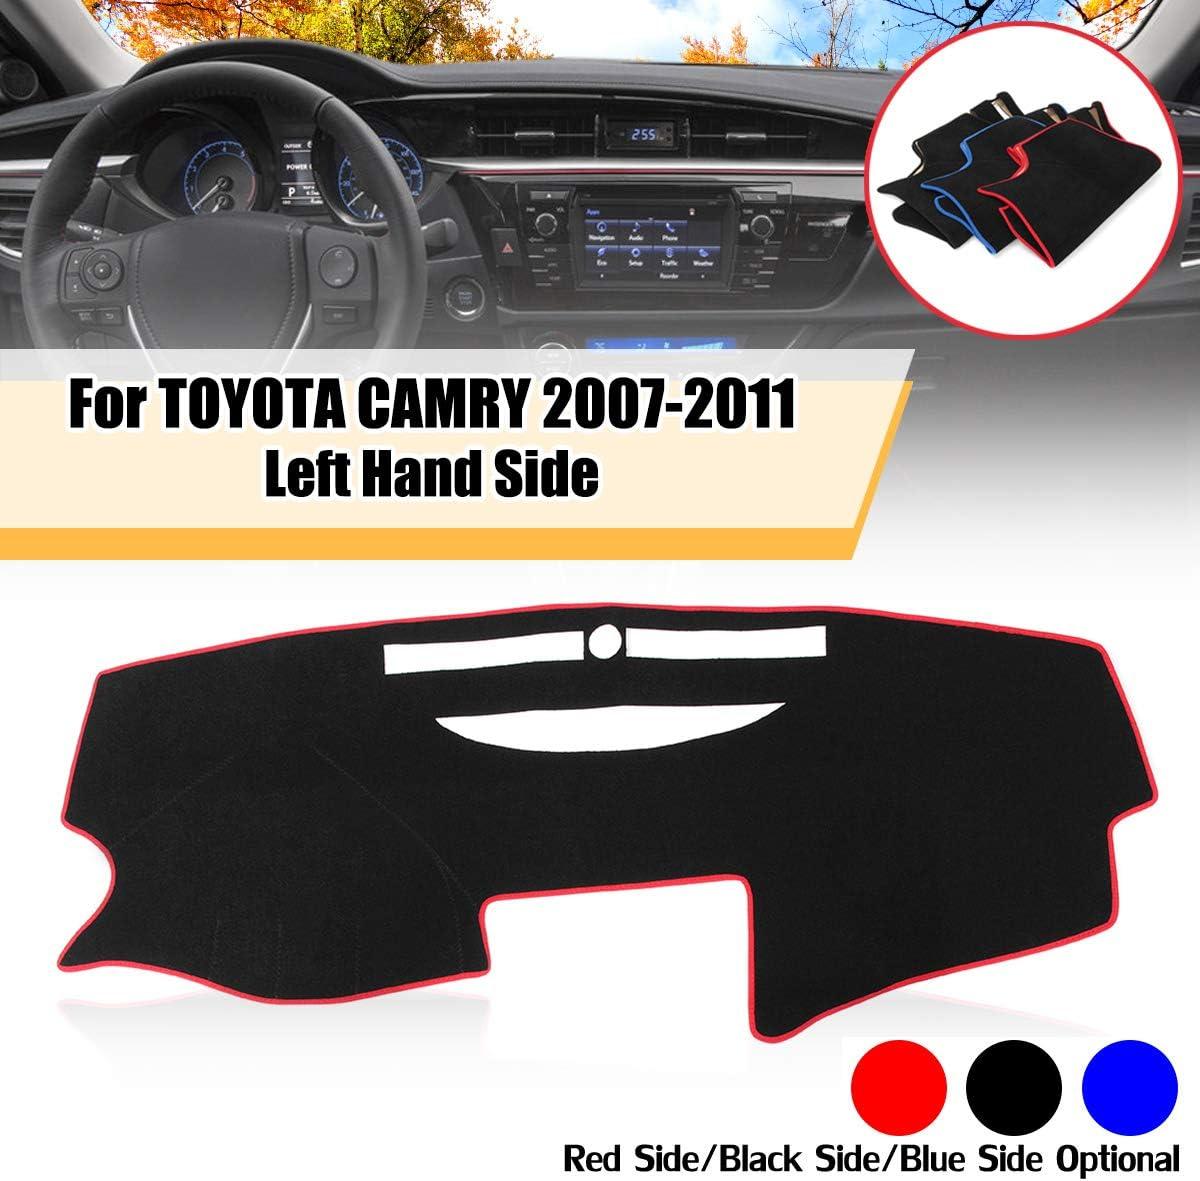 Sala-Store Dashboard Cover Dash Mat Dash Pad Dashmat Anti-Slip Carpet for Toyota Camry 2007 2008 2009 2010 2011